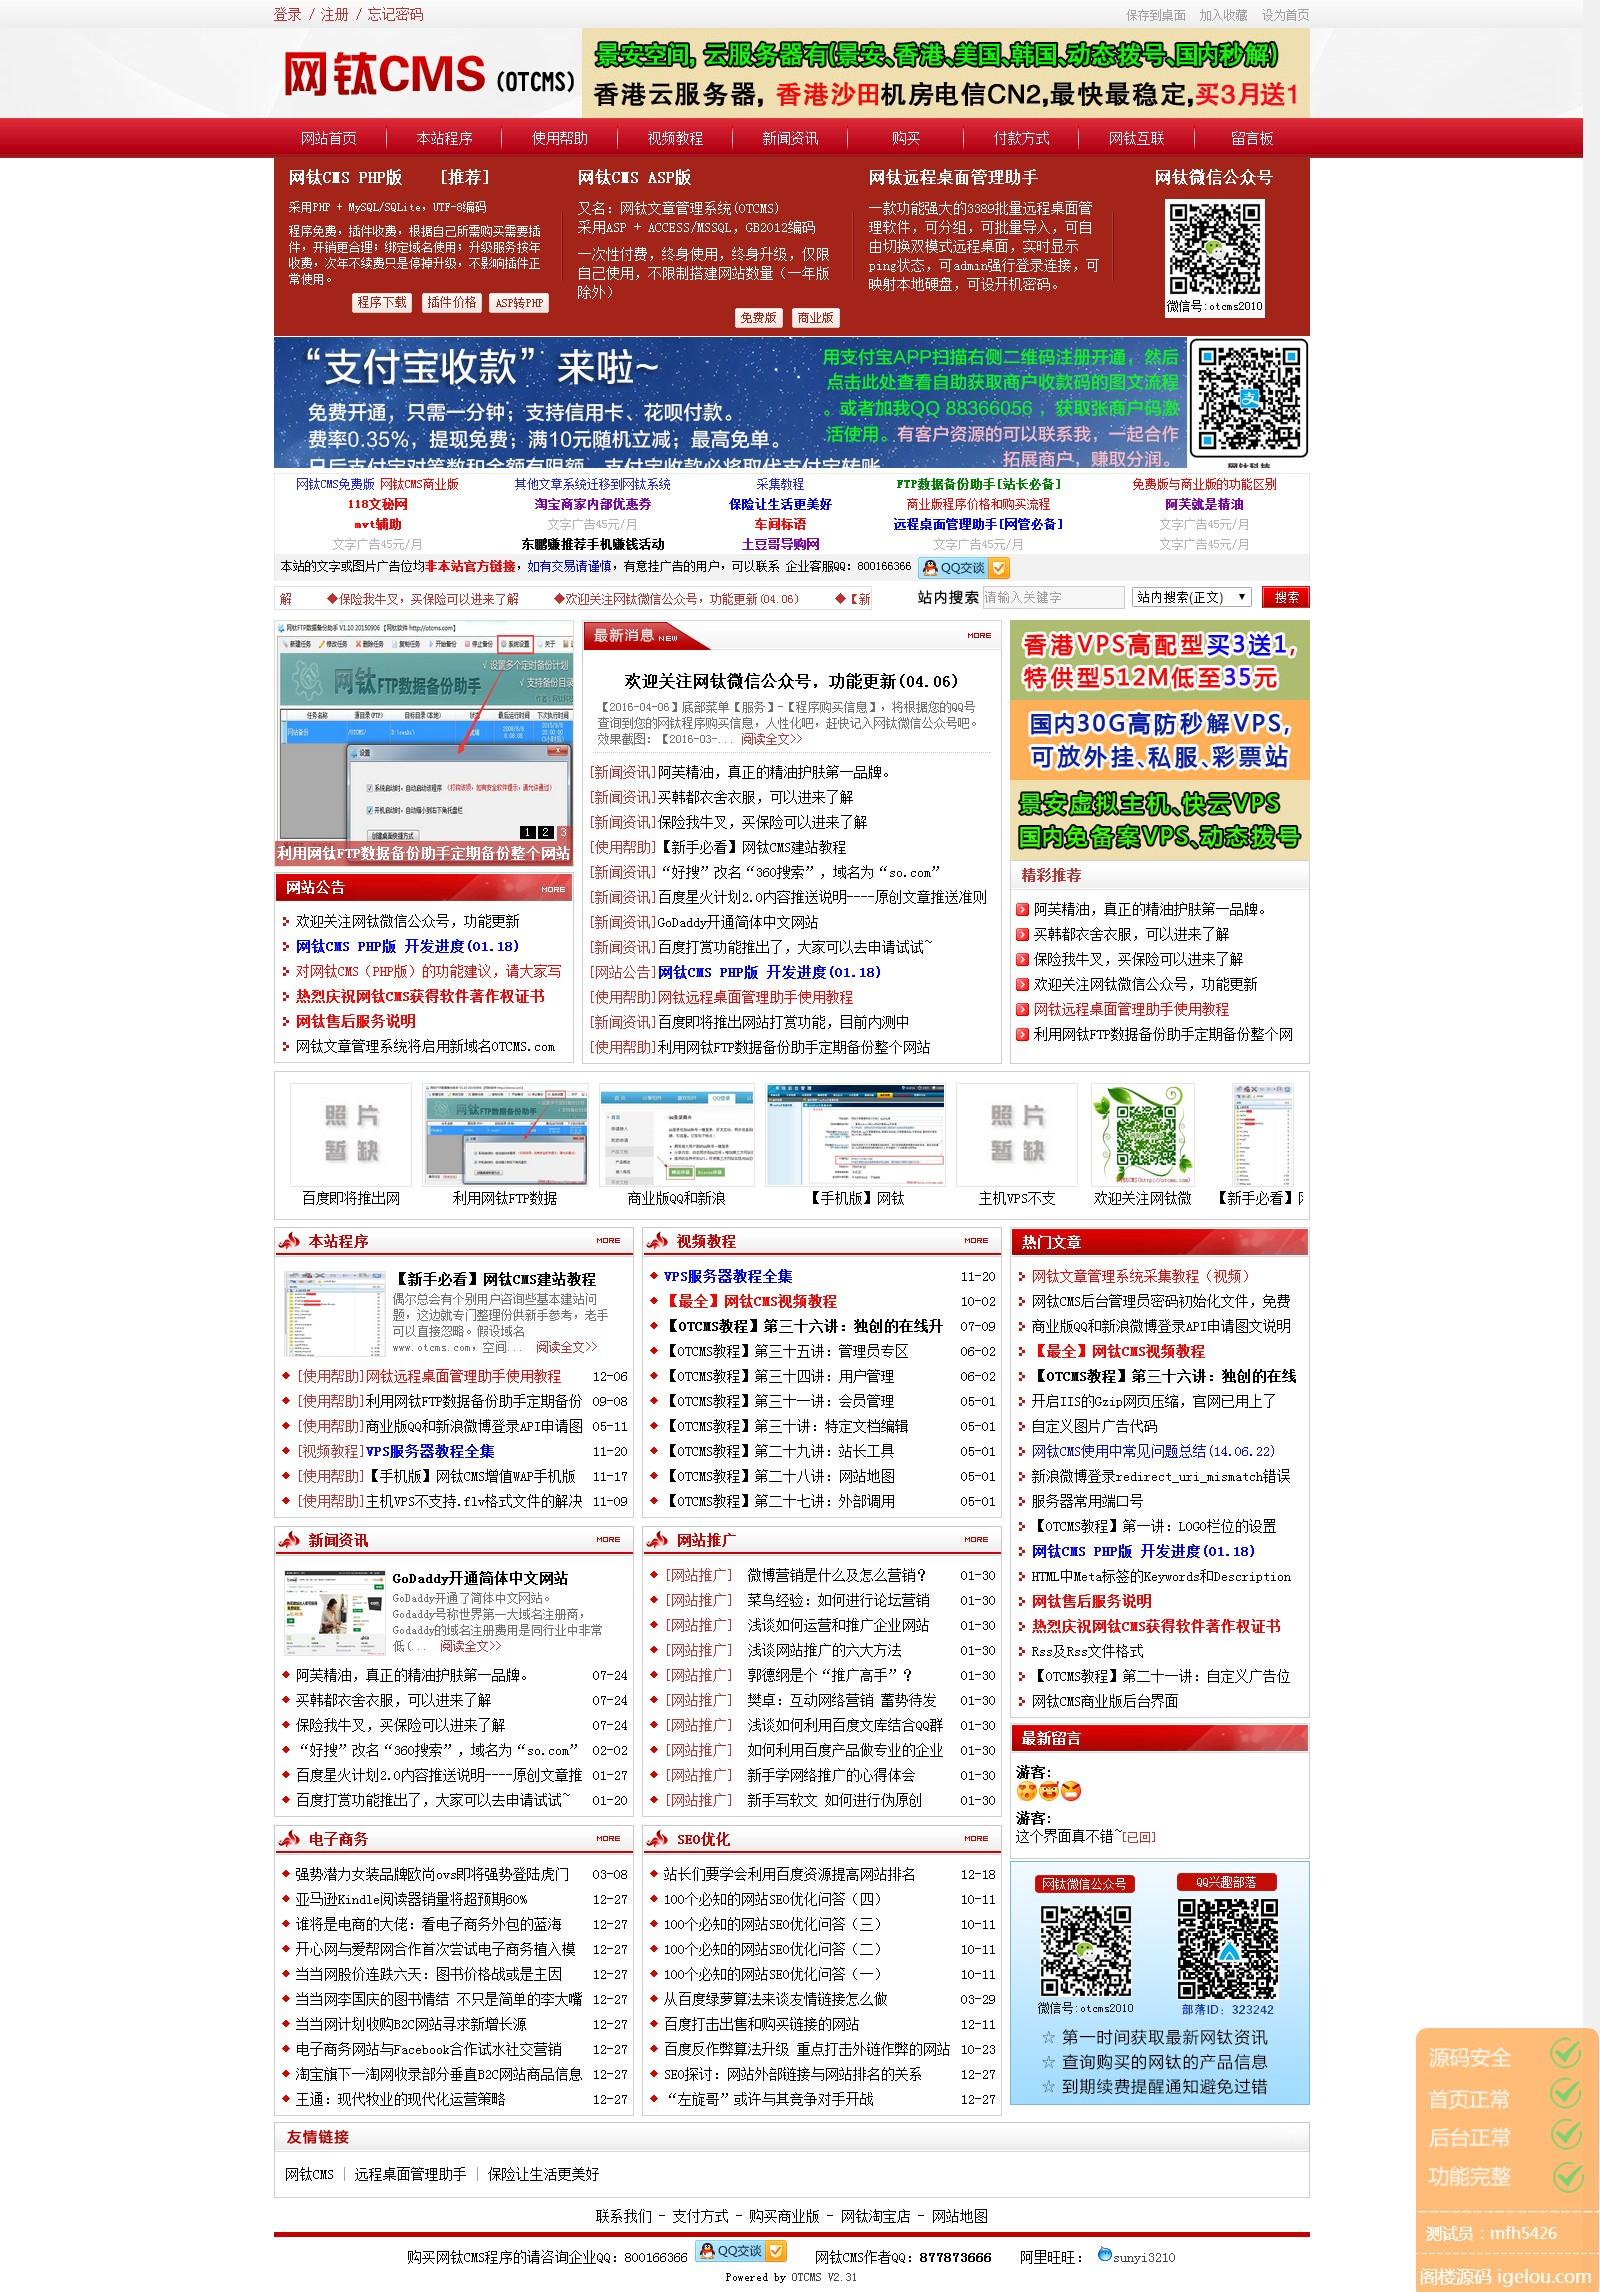 网钛CMS(OTCMS) PHP版 v2.31